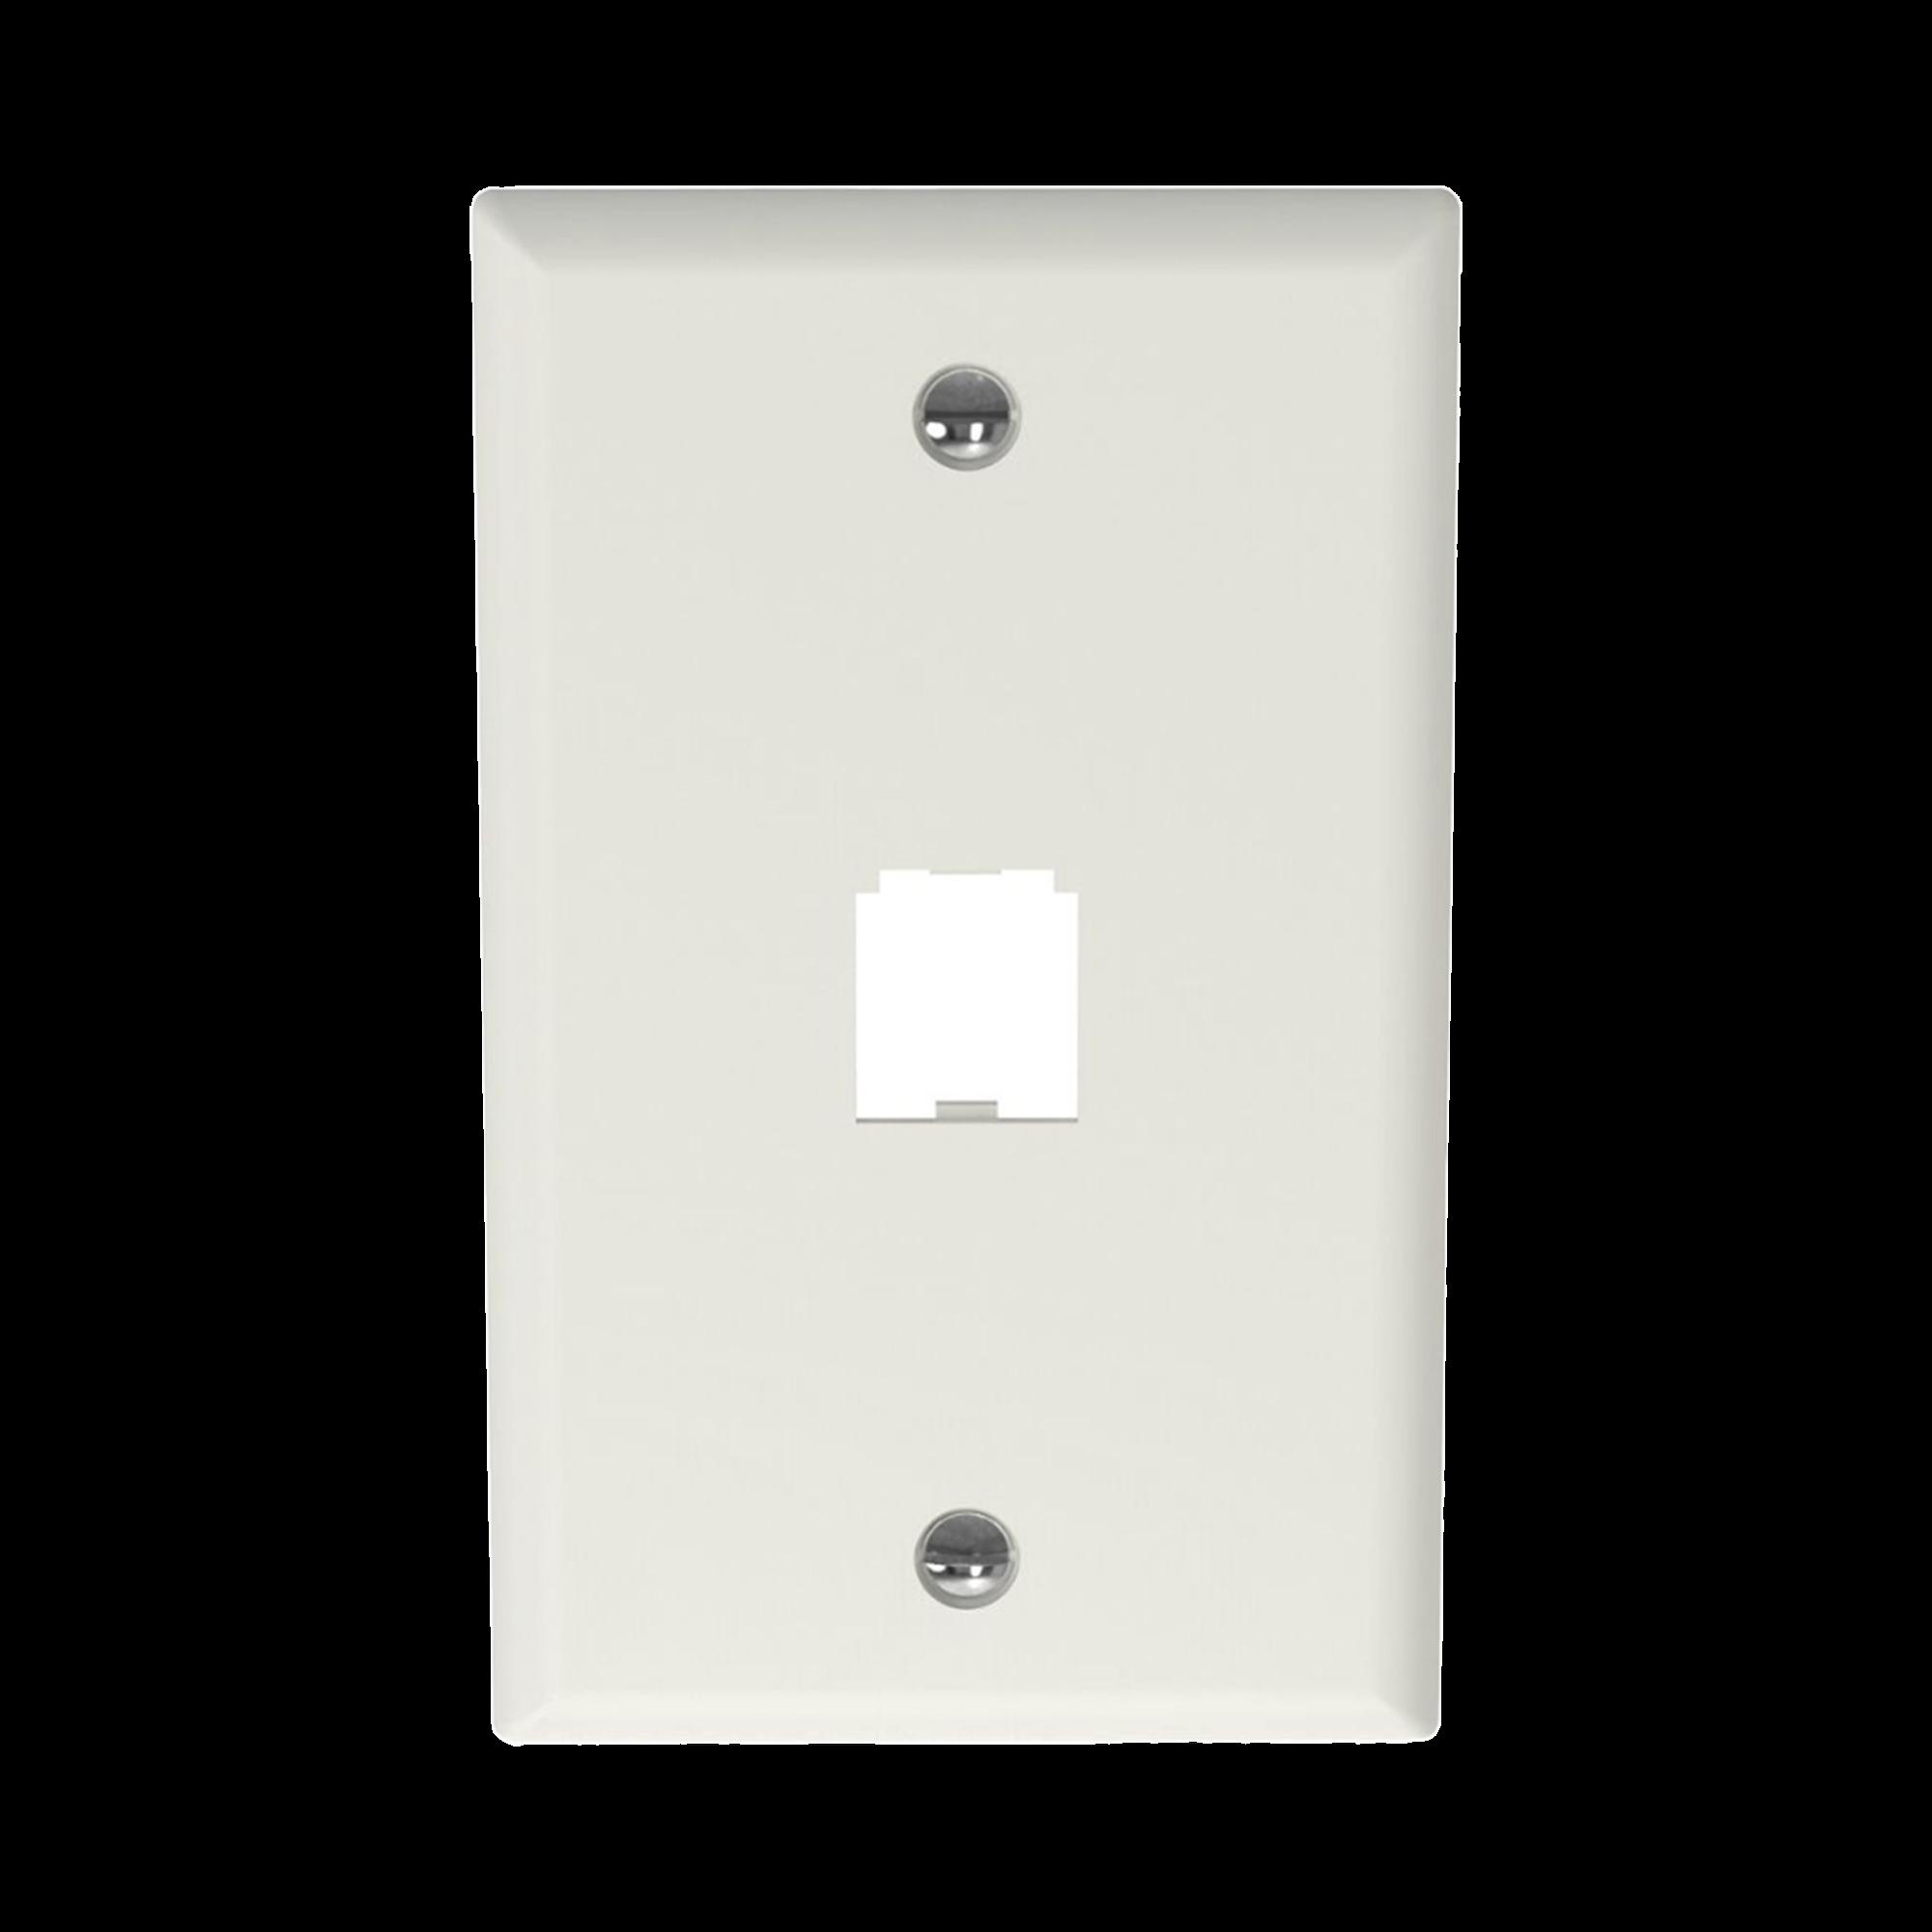 Placa de Pared Vertical Clásica, Salida Para 1 Puerto Mini-Com, Color Blanco Mate